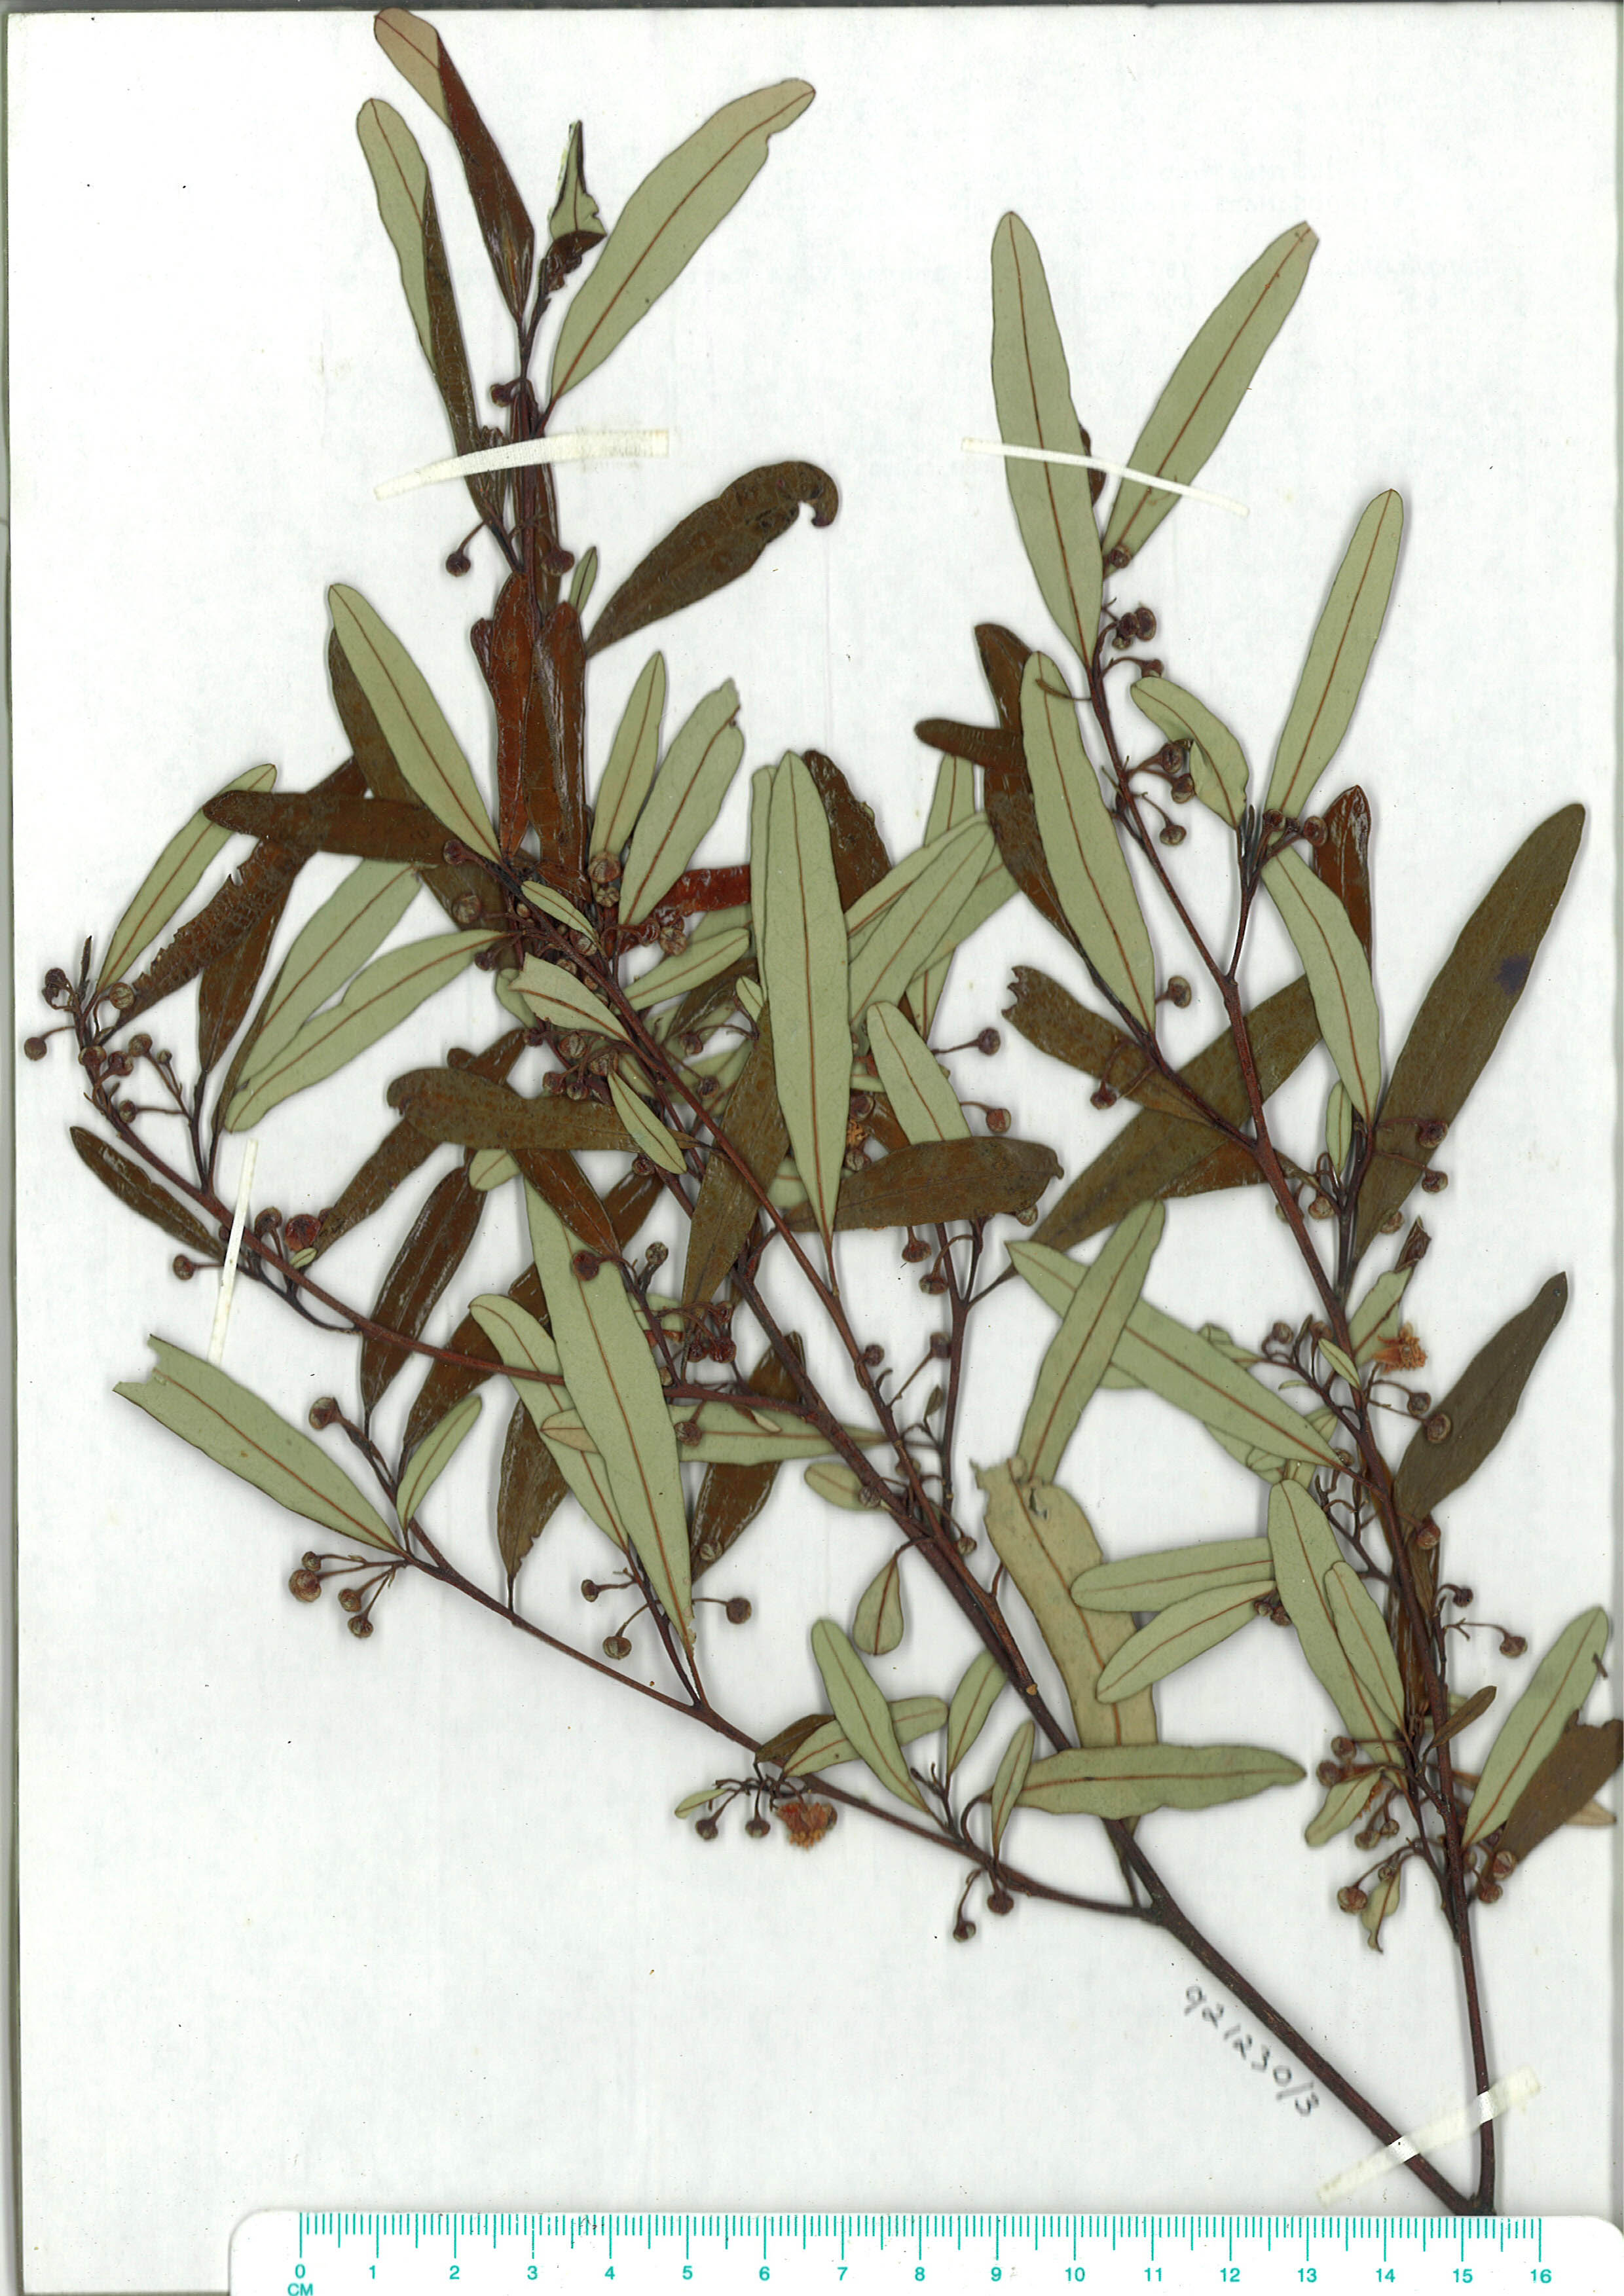 Scanned image of herbarium image of Beyeria lasiocarpa